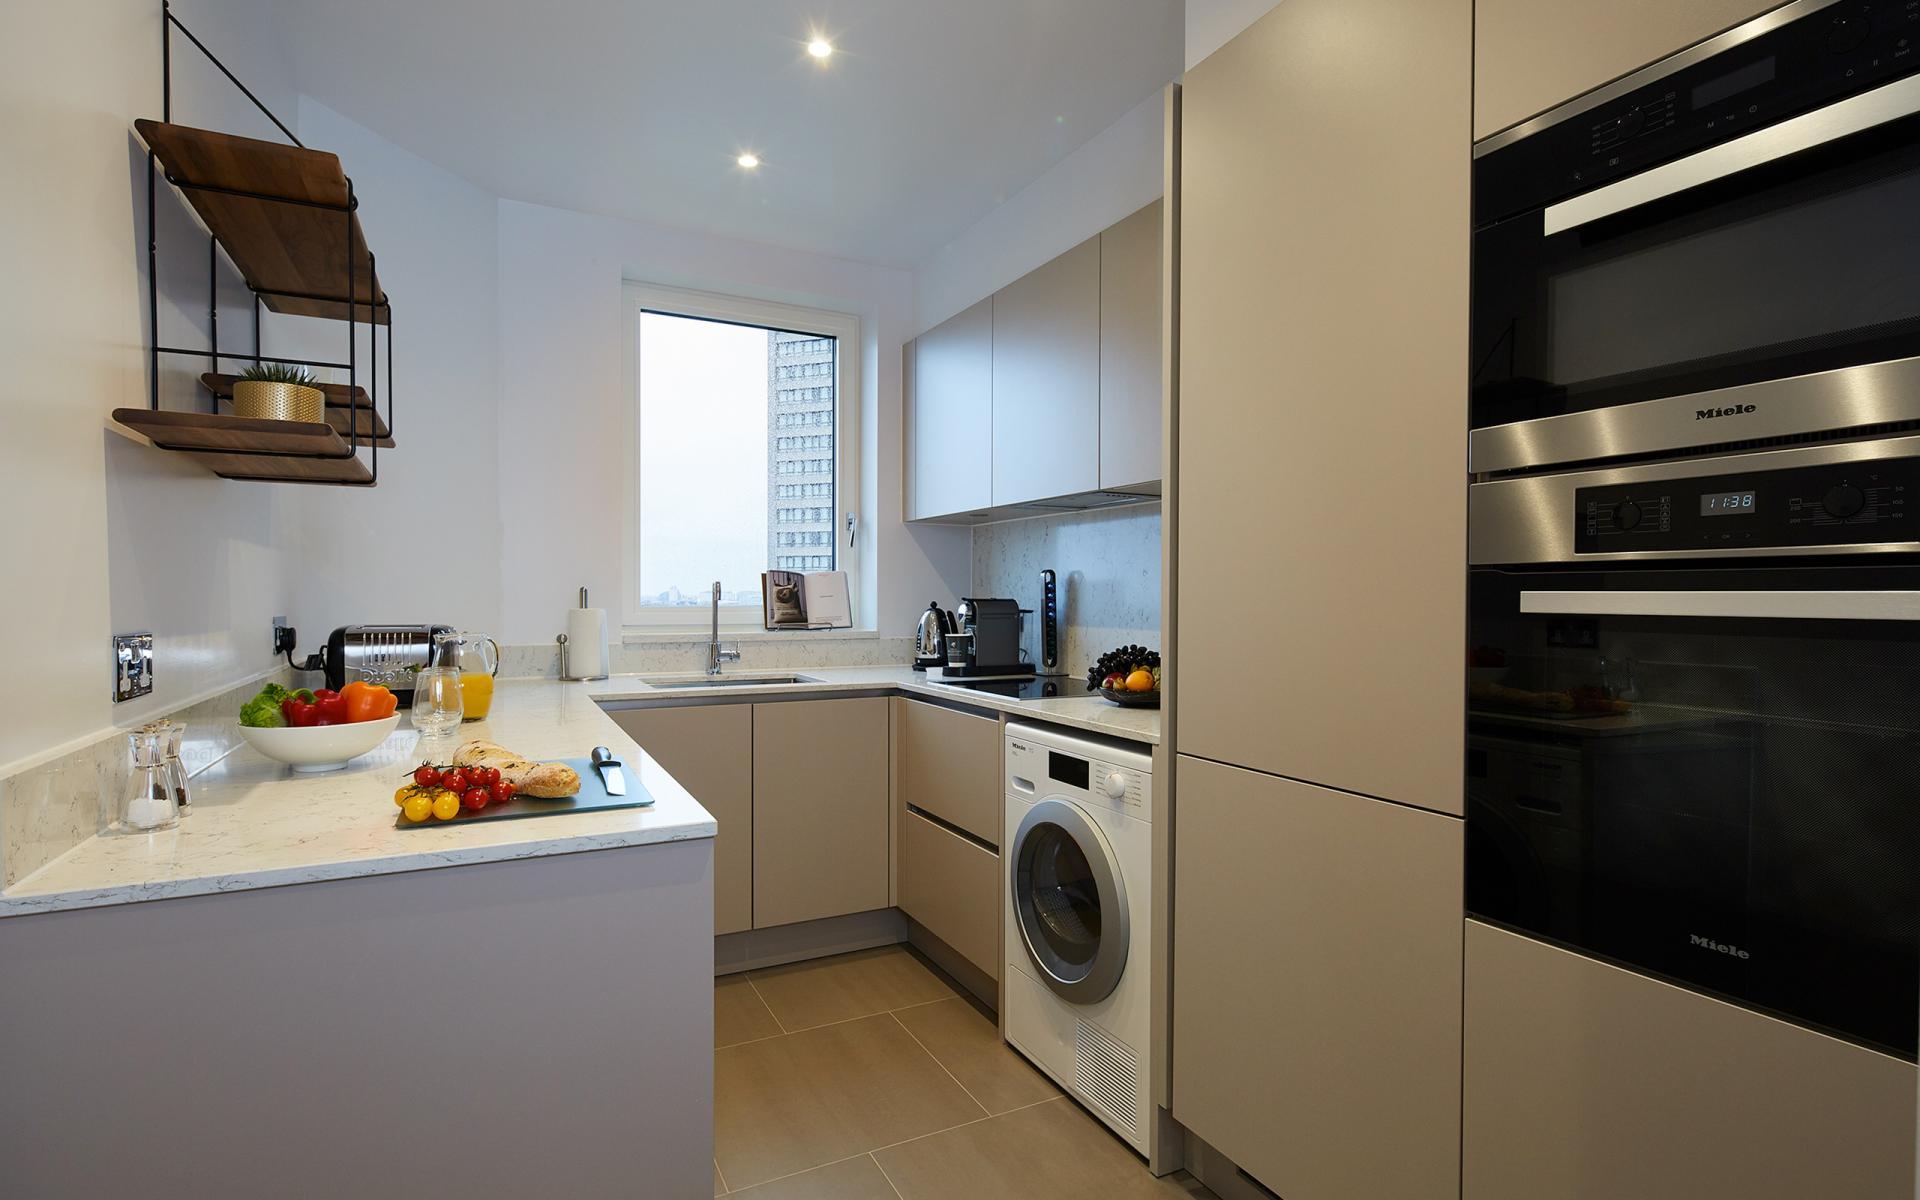 Kitchen at Cheval Gloucester Park, South Kensington, London - Citybase Apartments